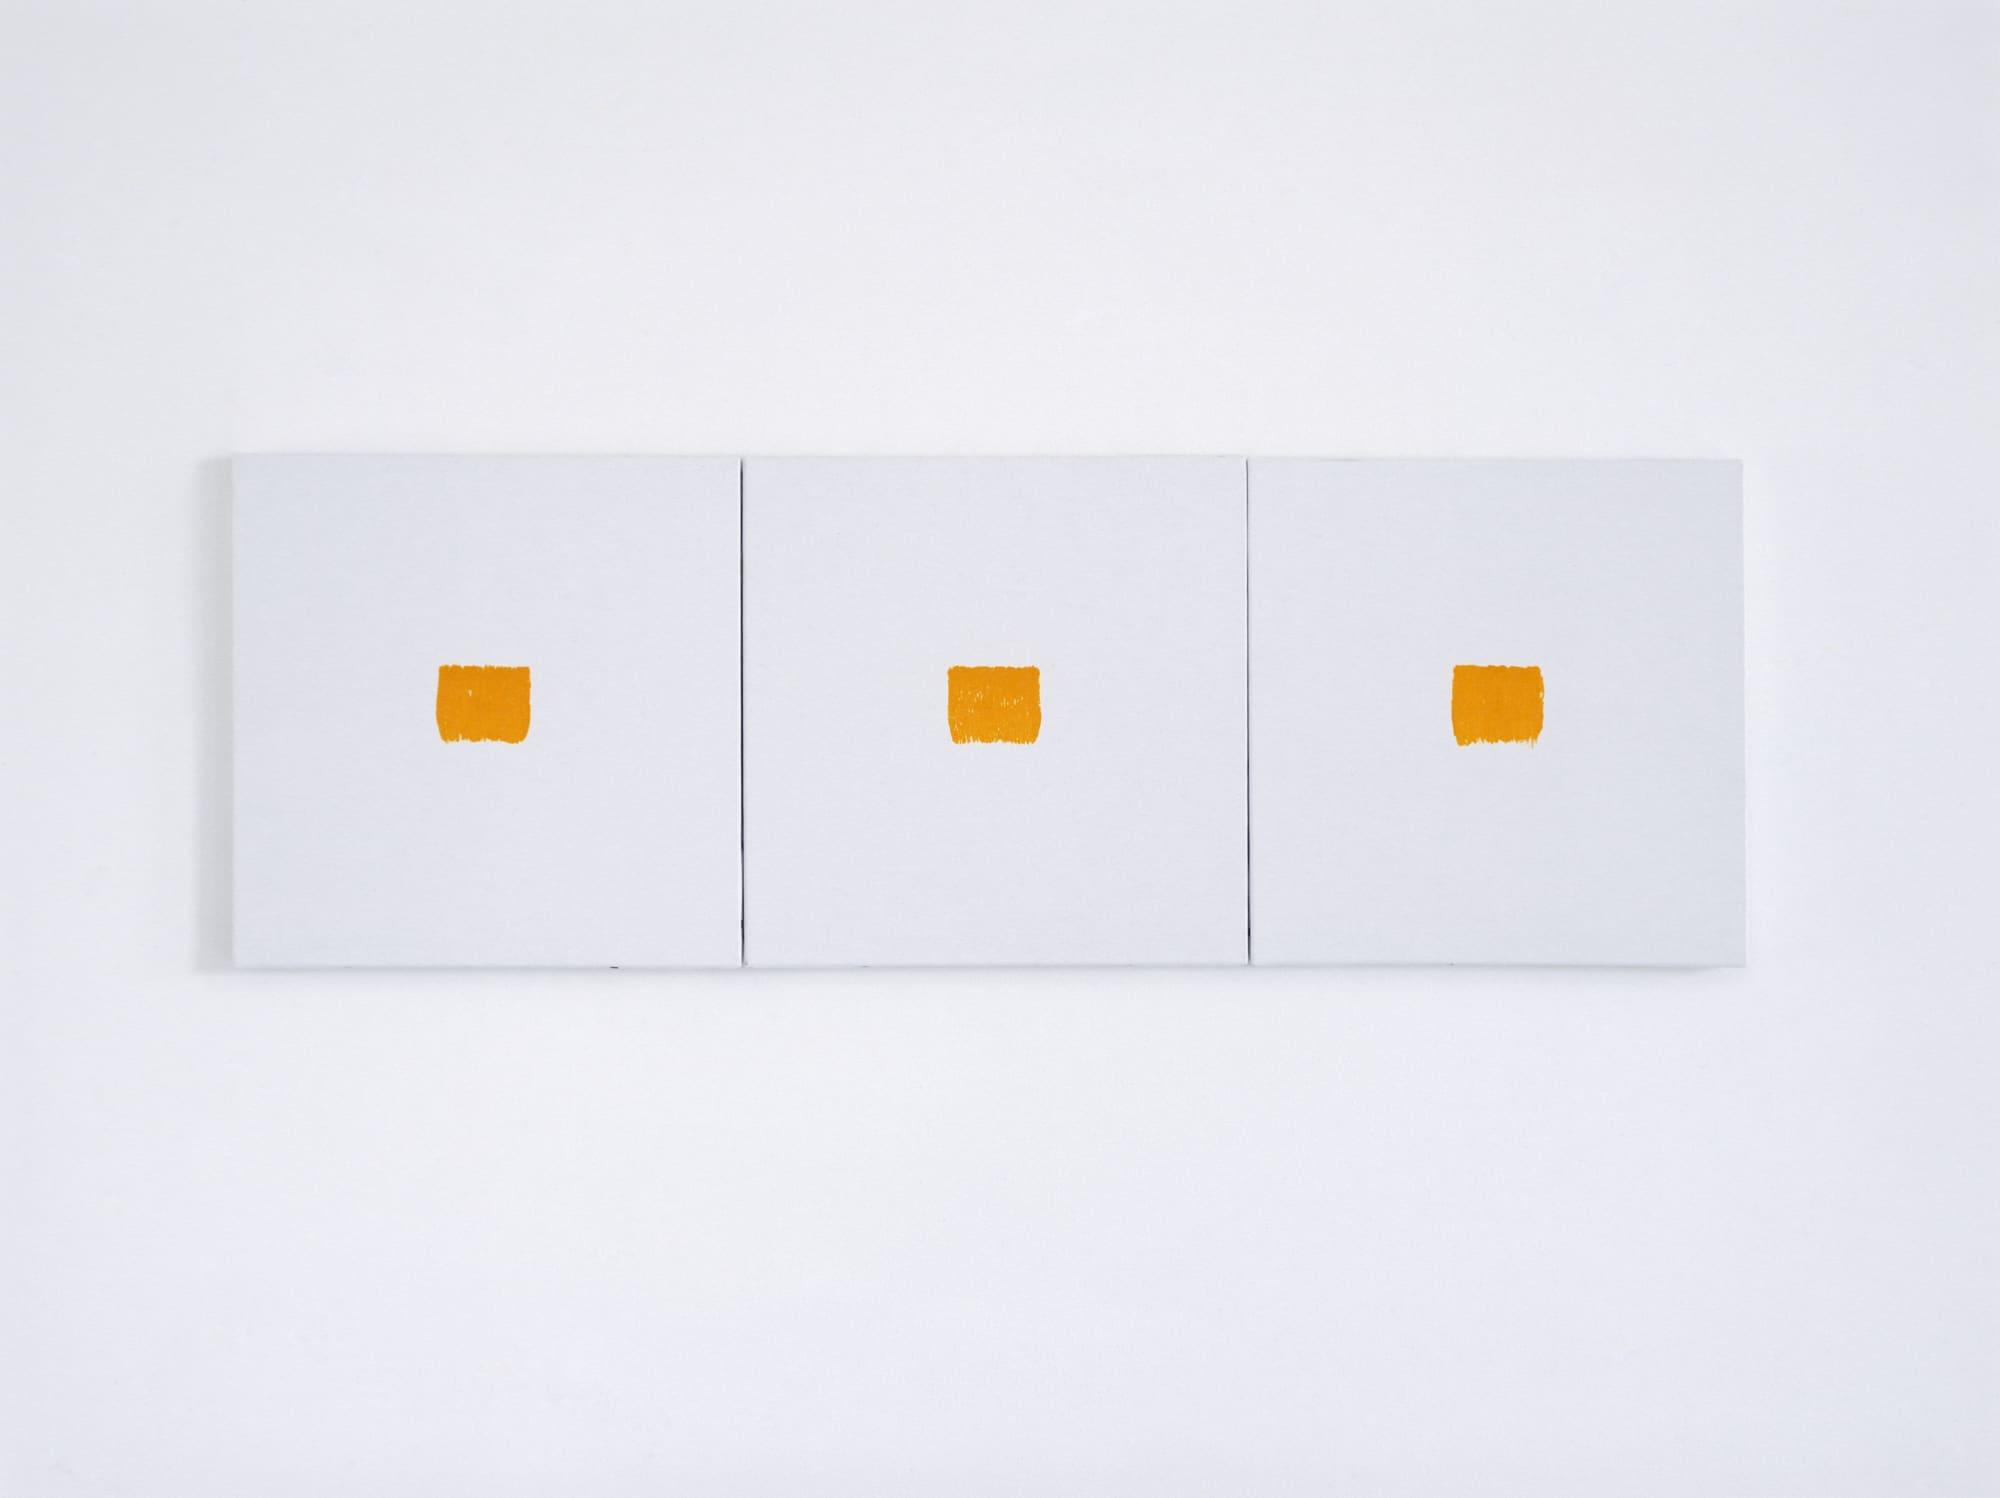 carte generation hdf 2020 Marian Goodman Gallery